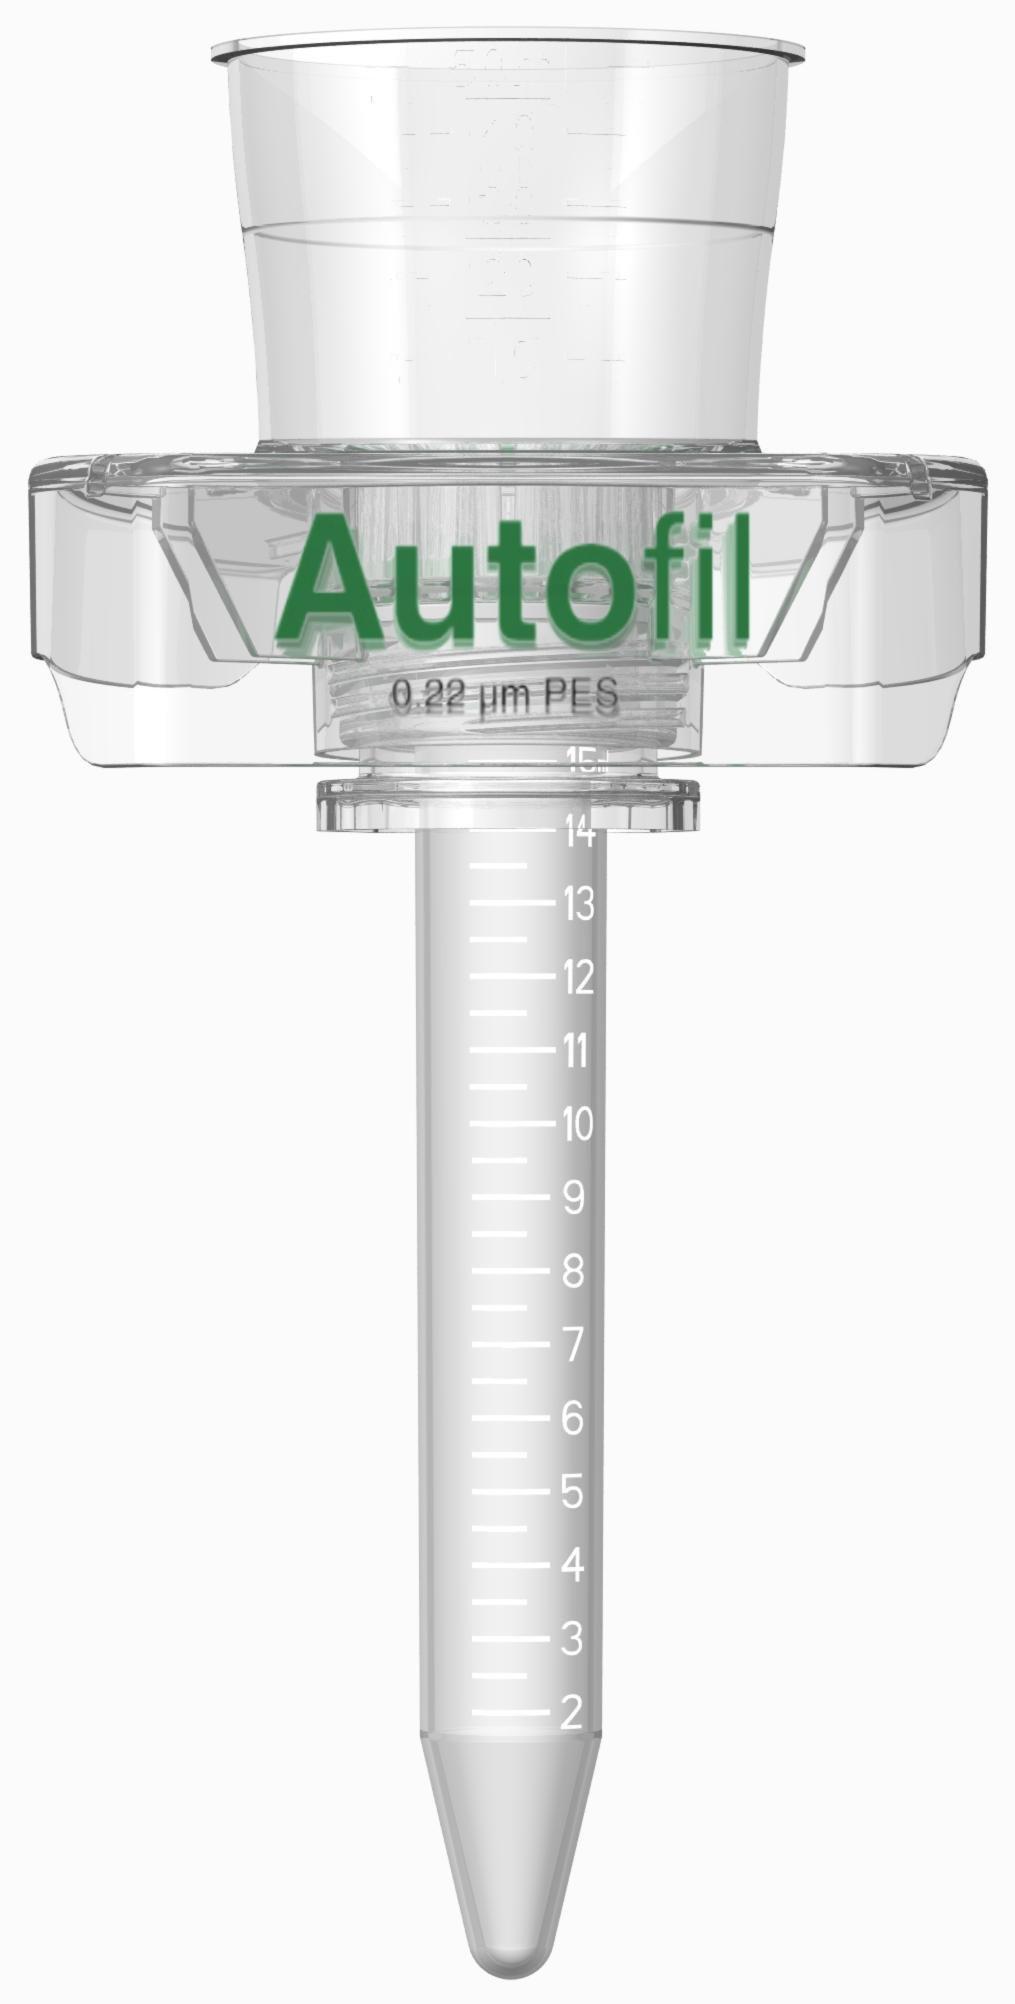 Autofil Sterile Disposable Centrifuge Tube Vacuum Filter Units with 0.45um PES Membrane for Prefiltration or Clarification, 50mL, 24/CS by Foxx Life Sciences